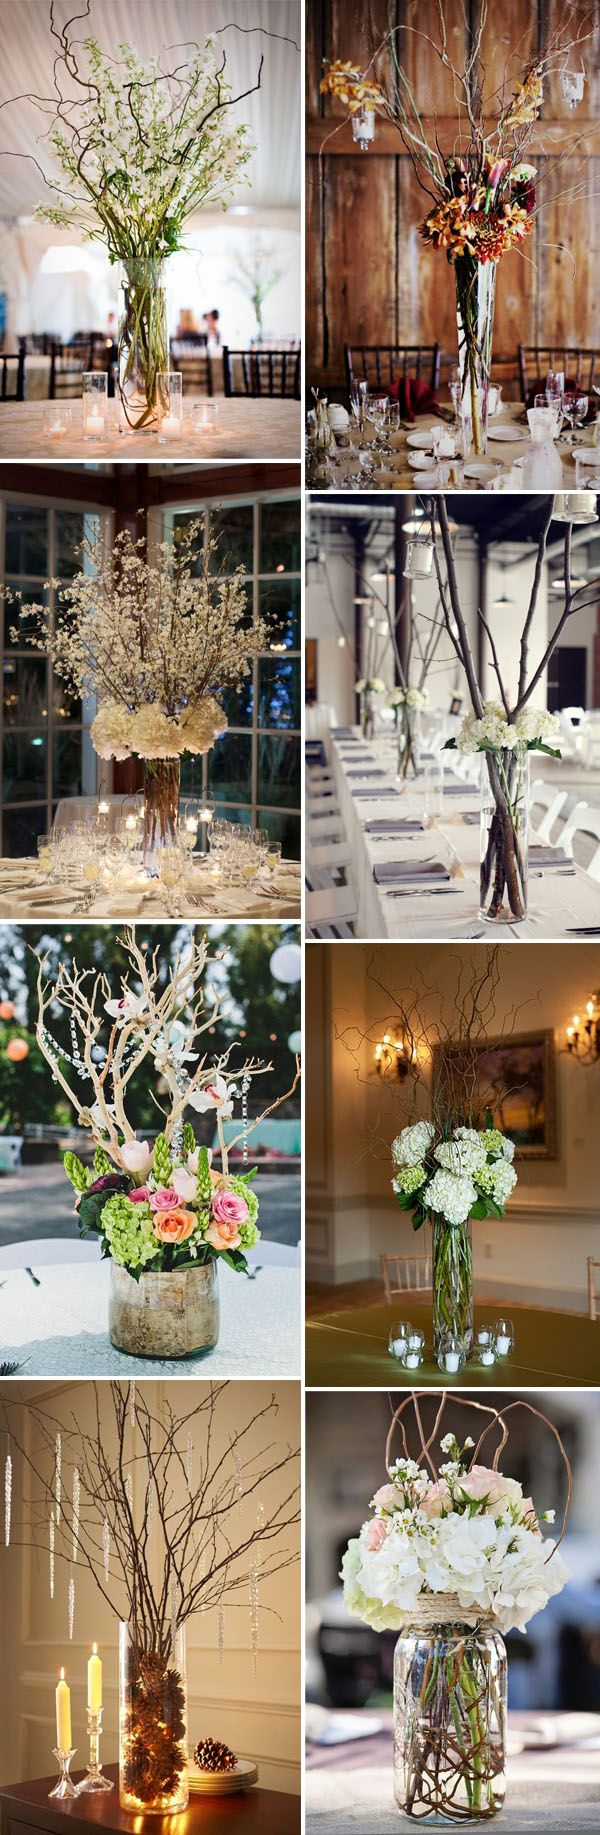 Wood wedding decoration ideas   Creative u Budgetfriendly DIY Wedding Decoration Ideas  Our